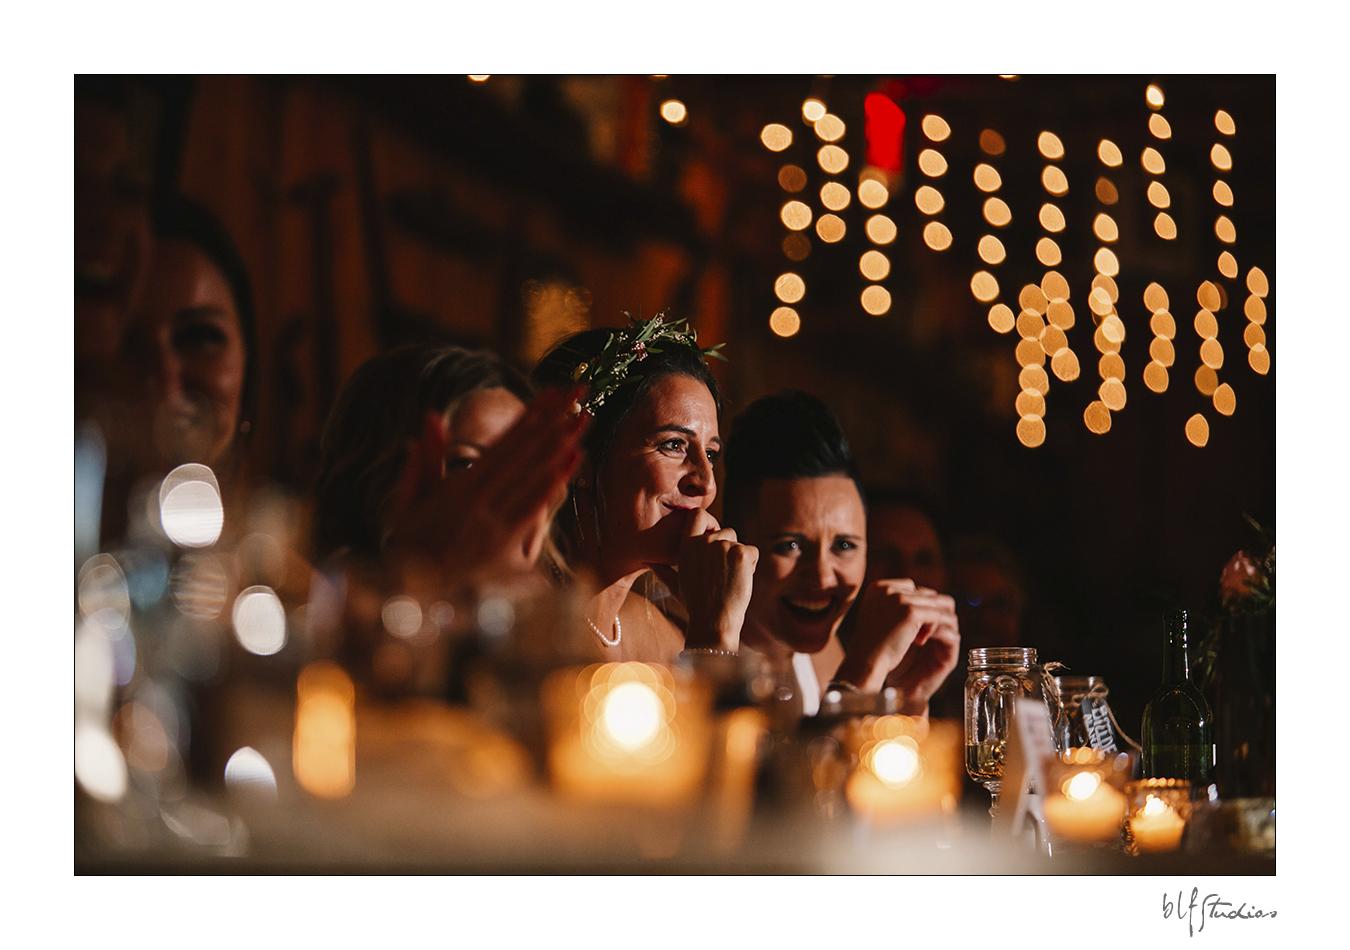 039-winnipeg-hitchnpost-wedding-marla-alana.jpg